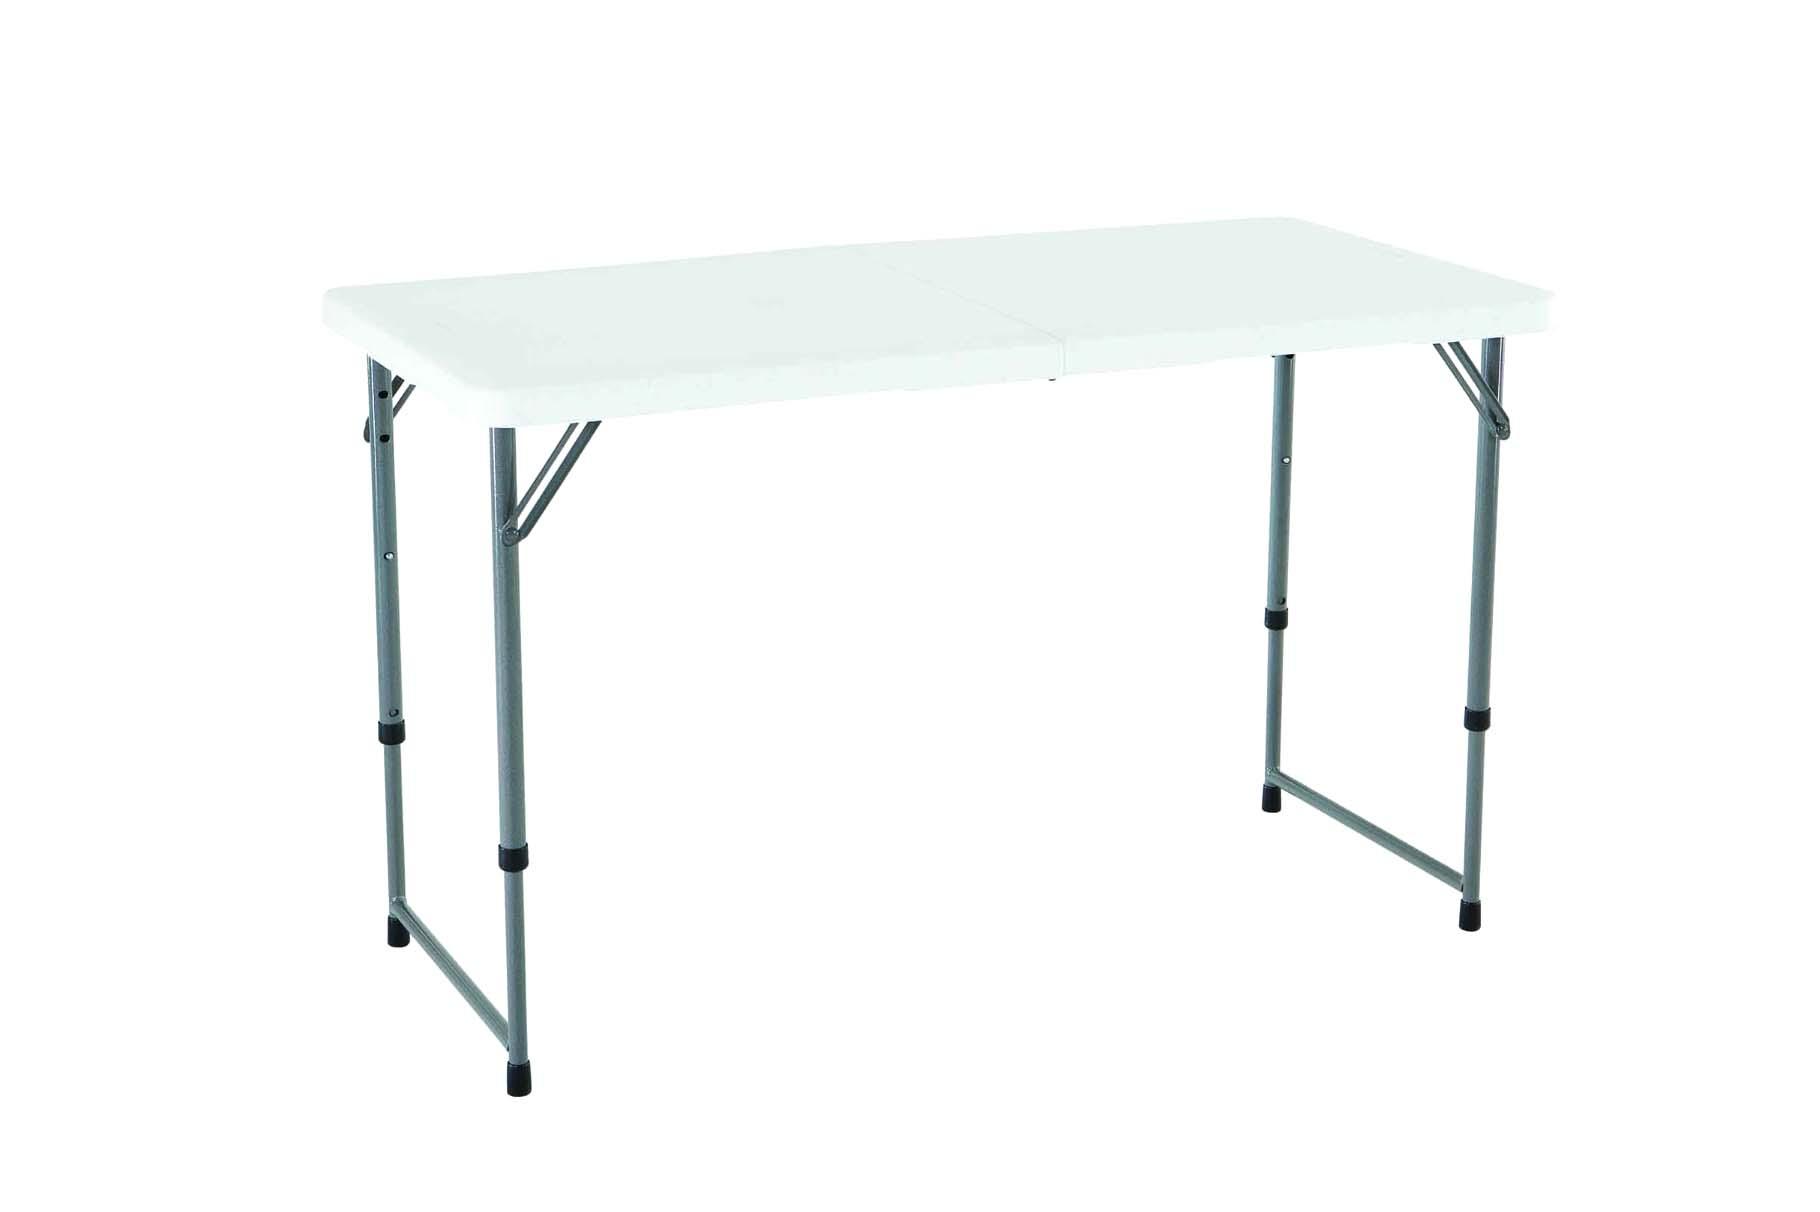 Folding Table 4 Ft - Adjustable Height - 4.5 stars - $29 (Prime)